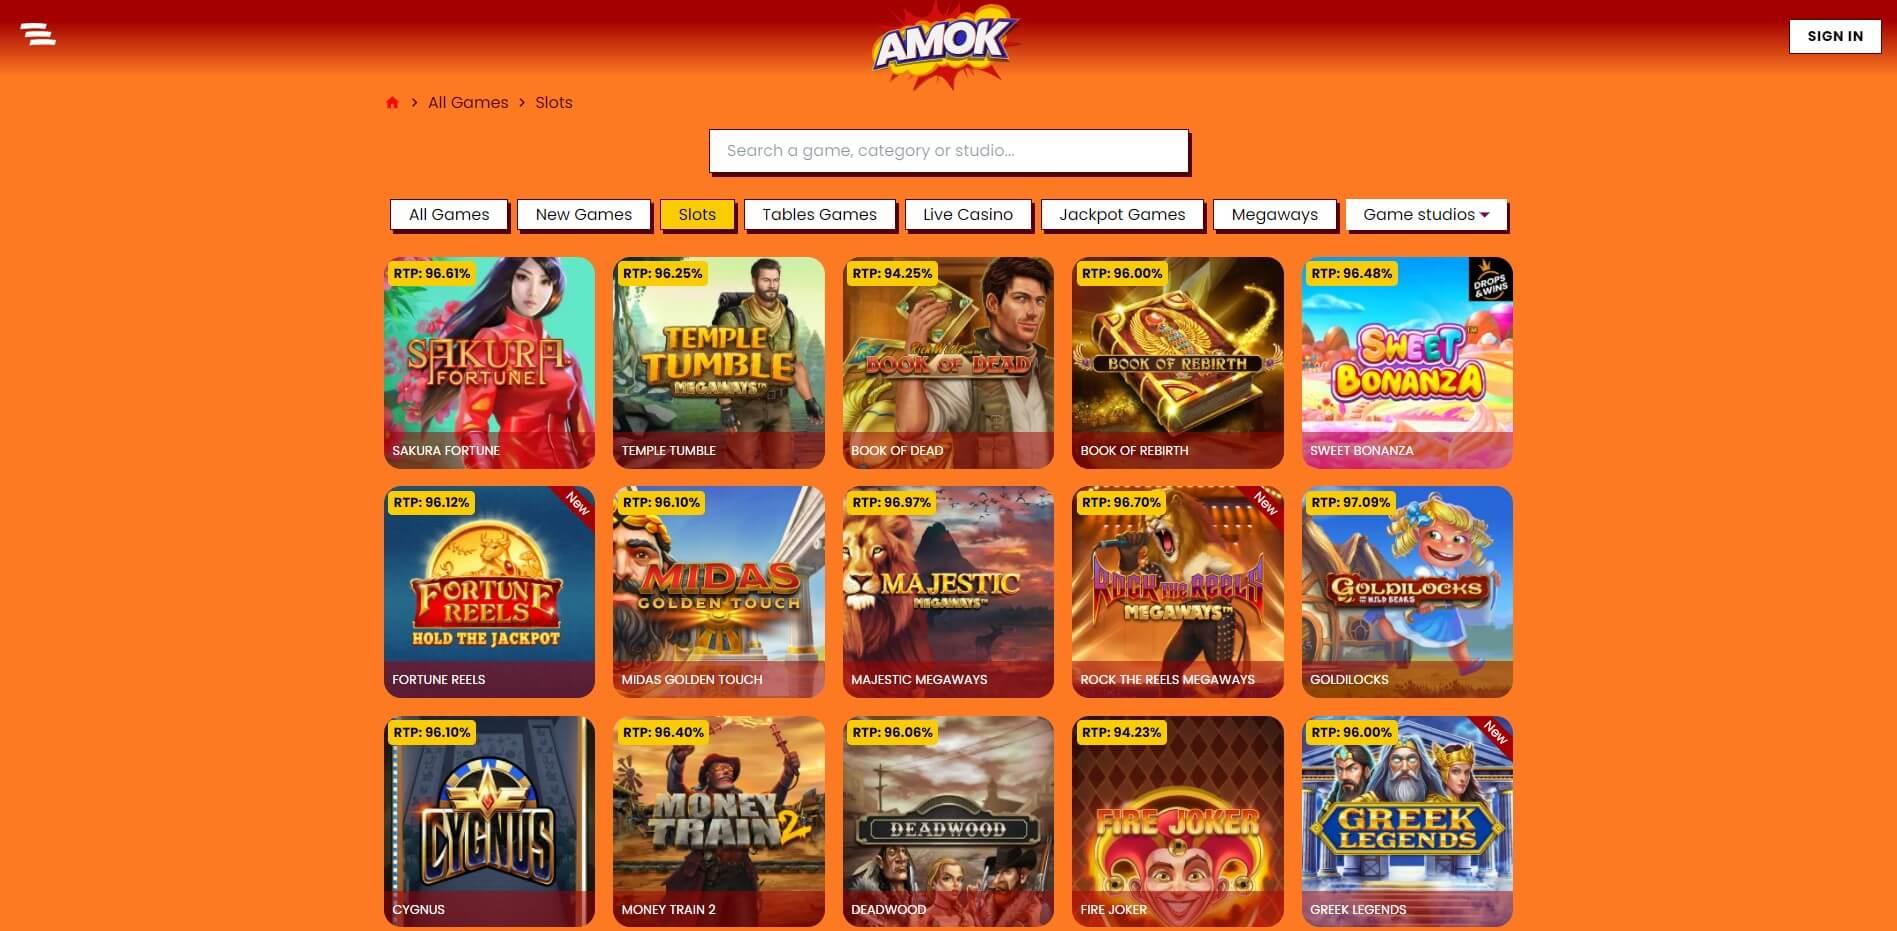 Games at Amok Casino